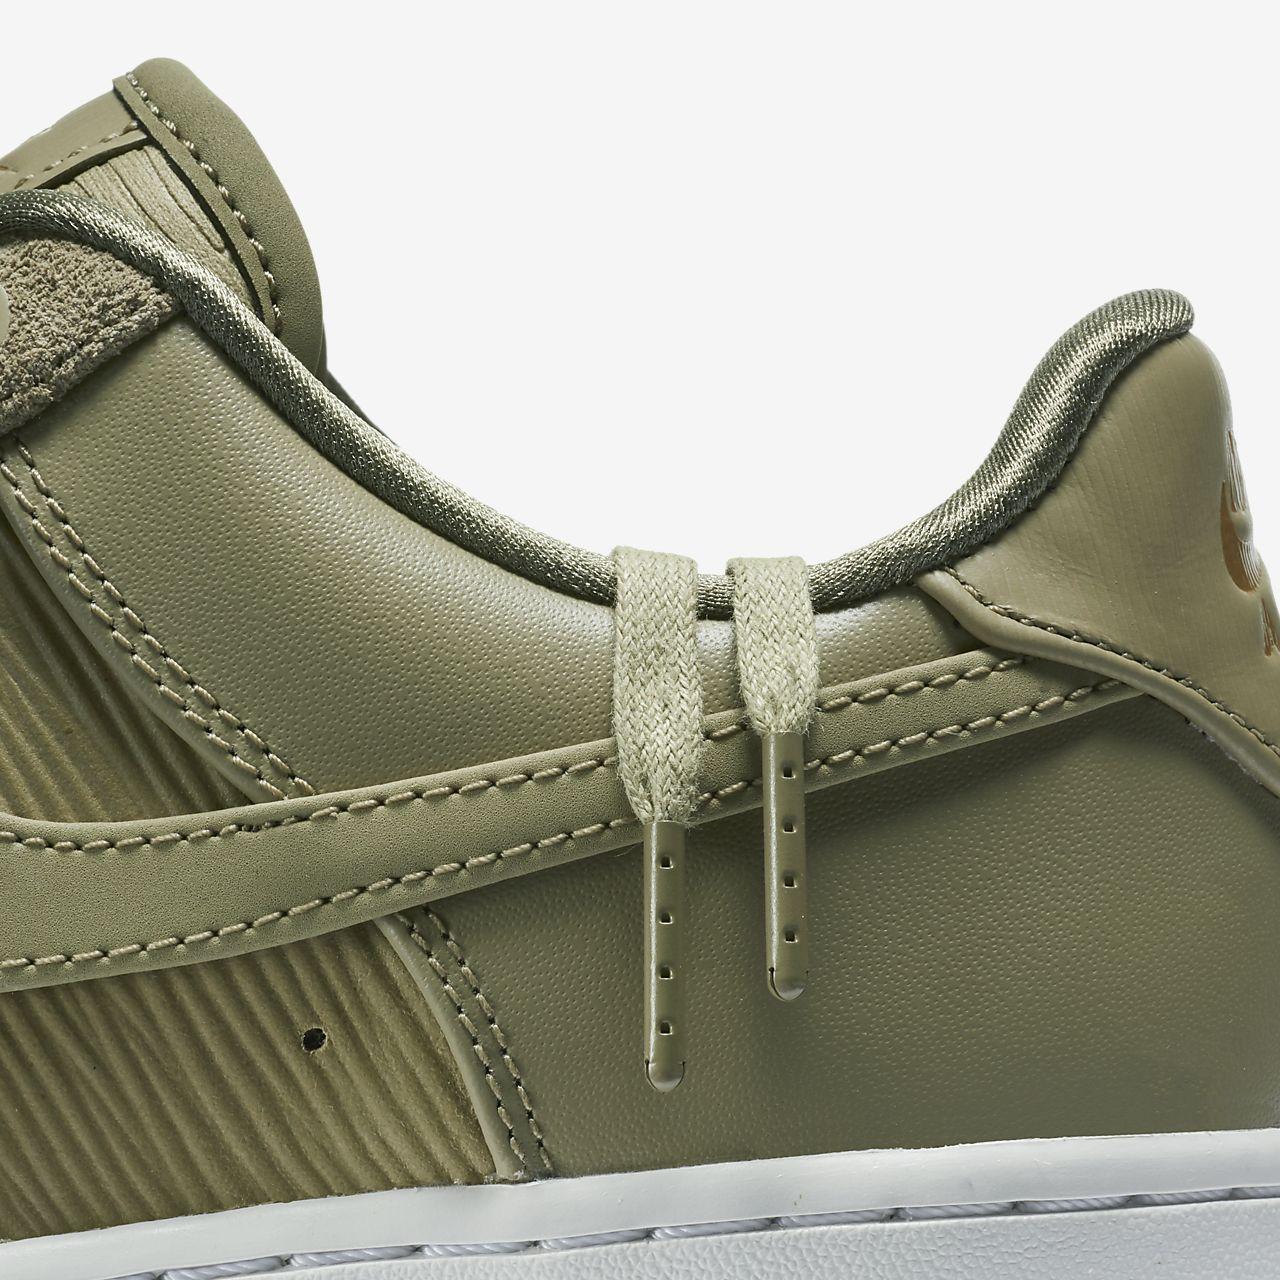 ... Nike Air Force 1 '07 LX Women's Shoe